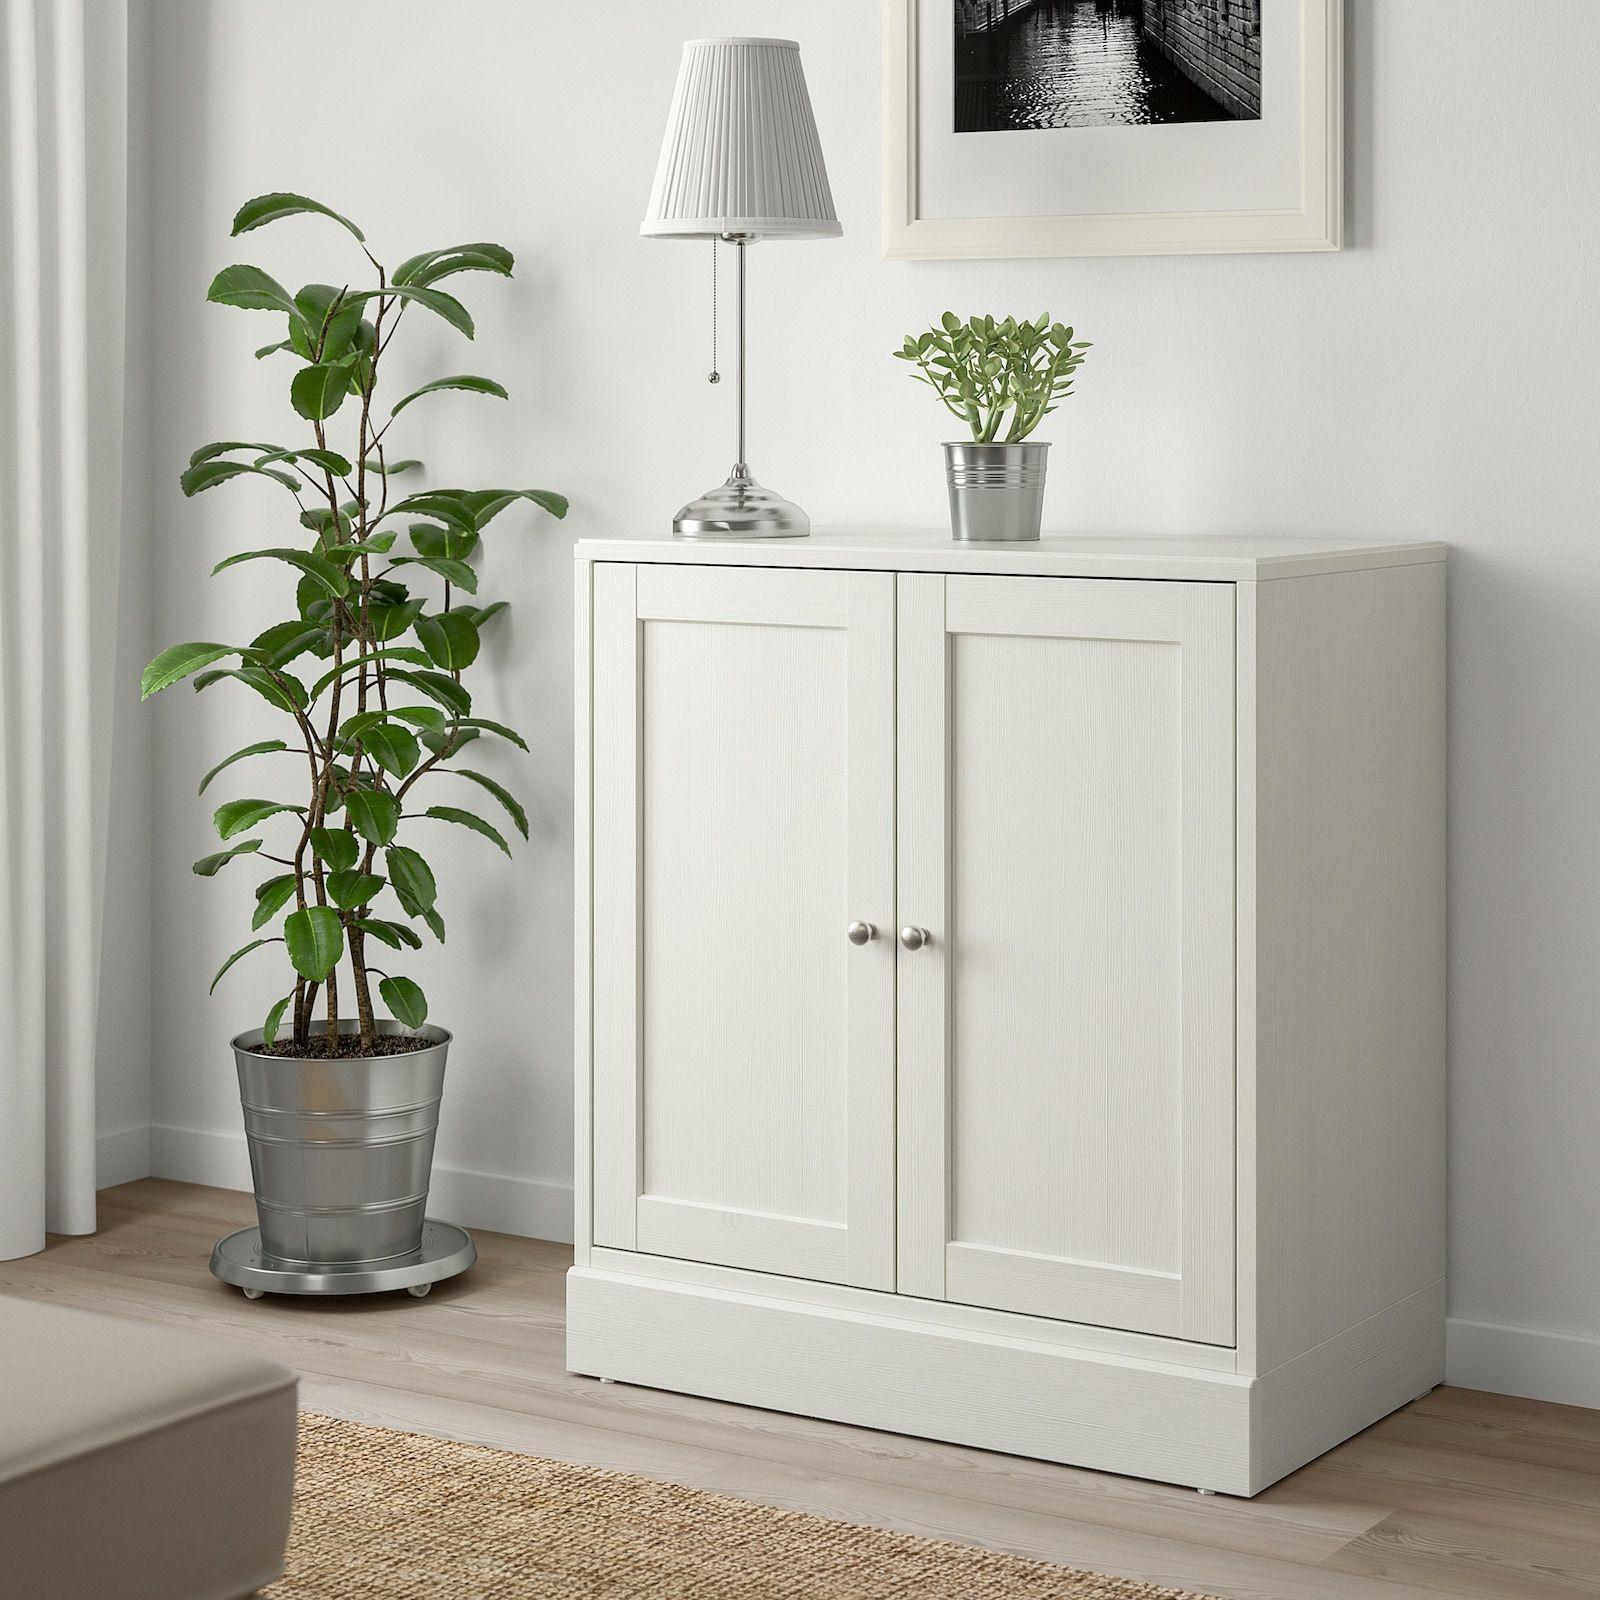 "HAVSTA with base, white, 31 7/8x18 1/2x35"" IKEA"